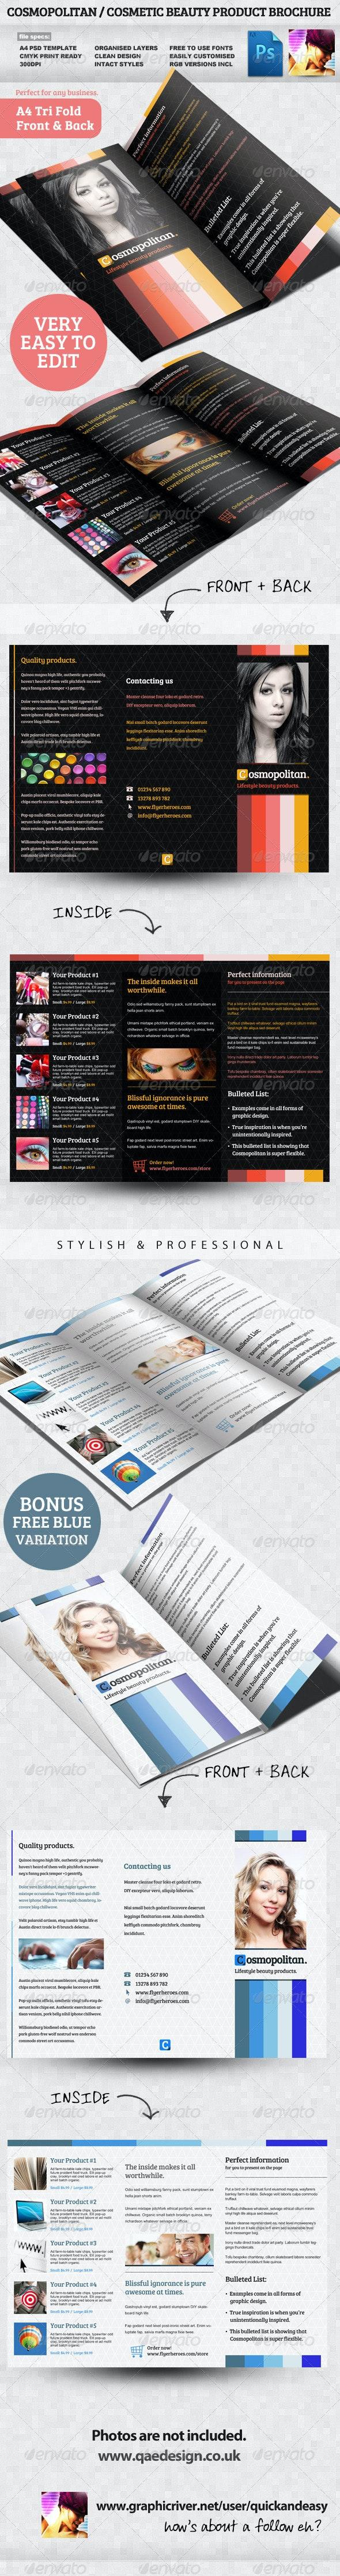 Cosmopolitan Tri-fold Brochure Template - Brochures Print Templates